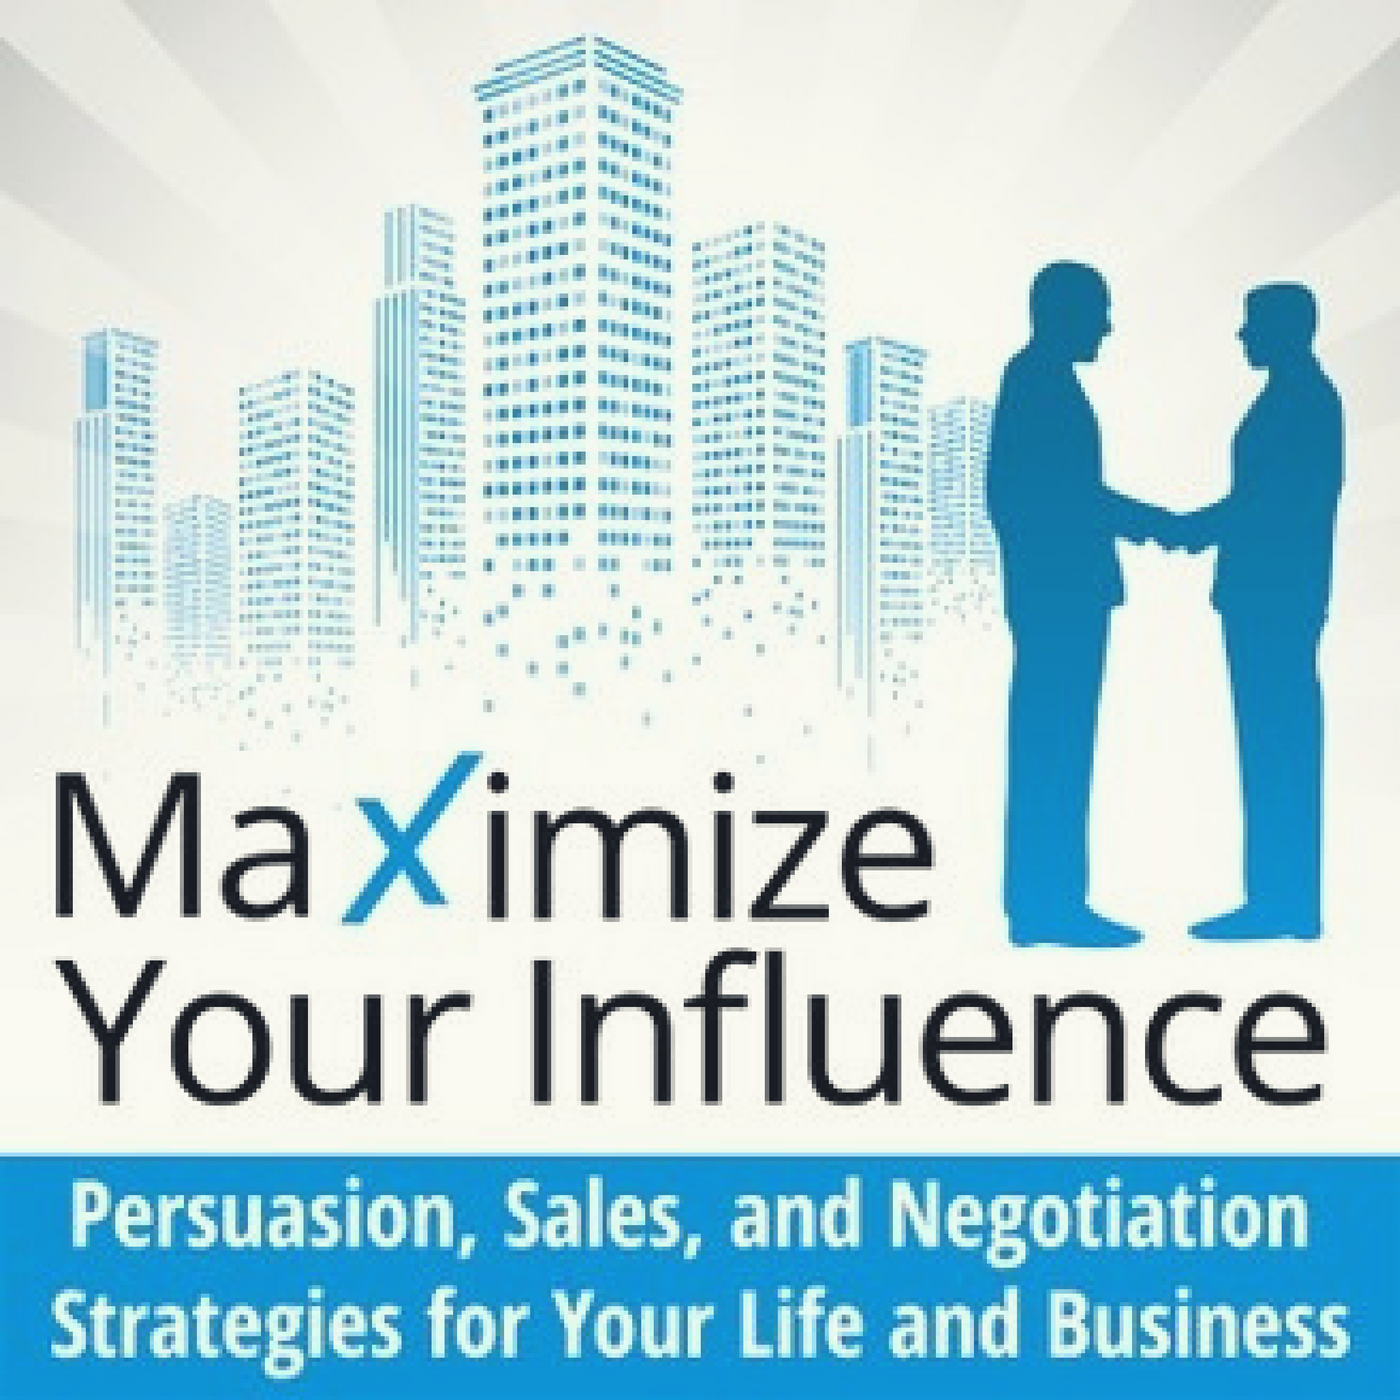 Maximize Your Influence logo